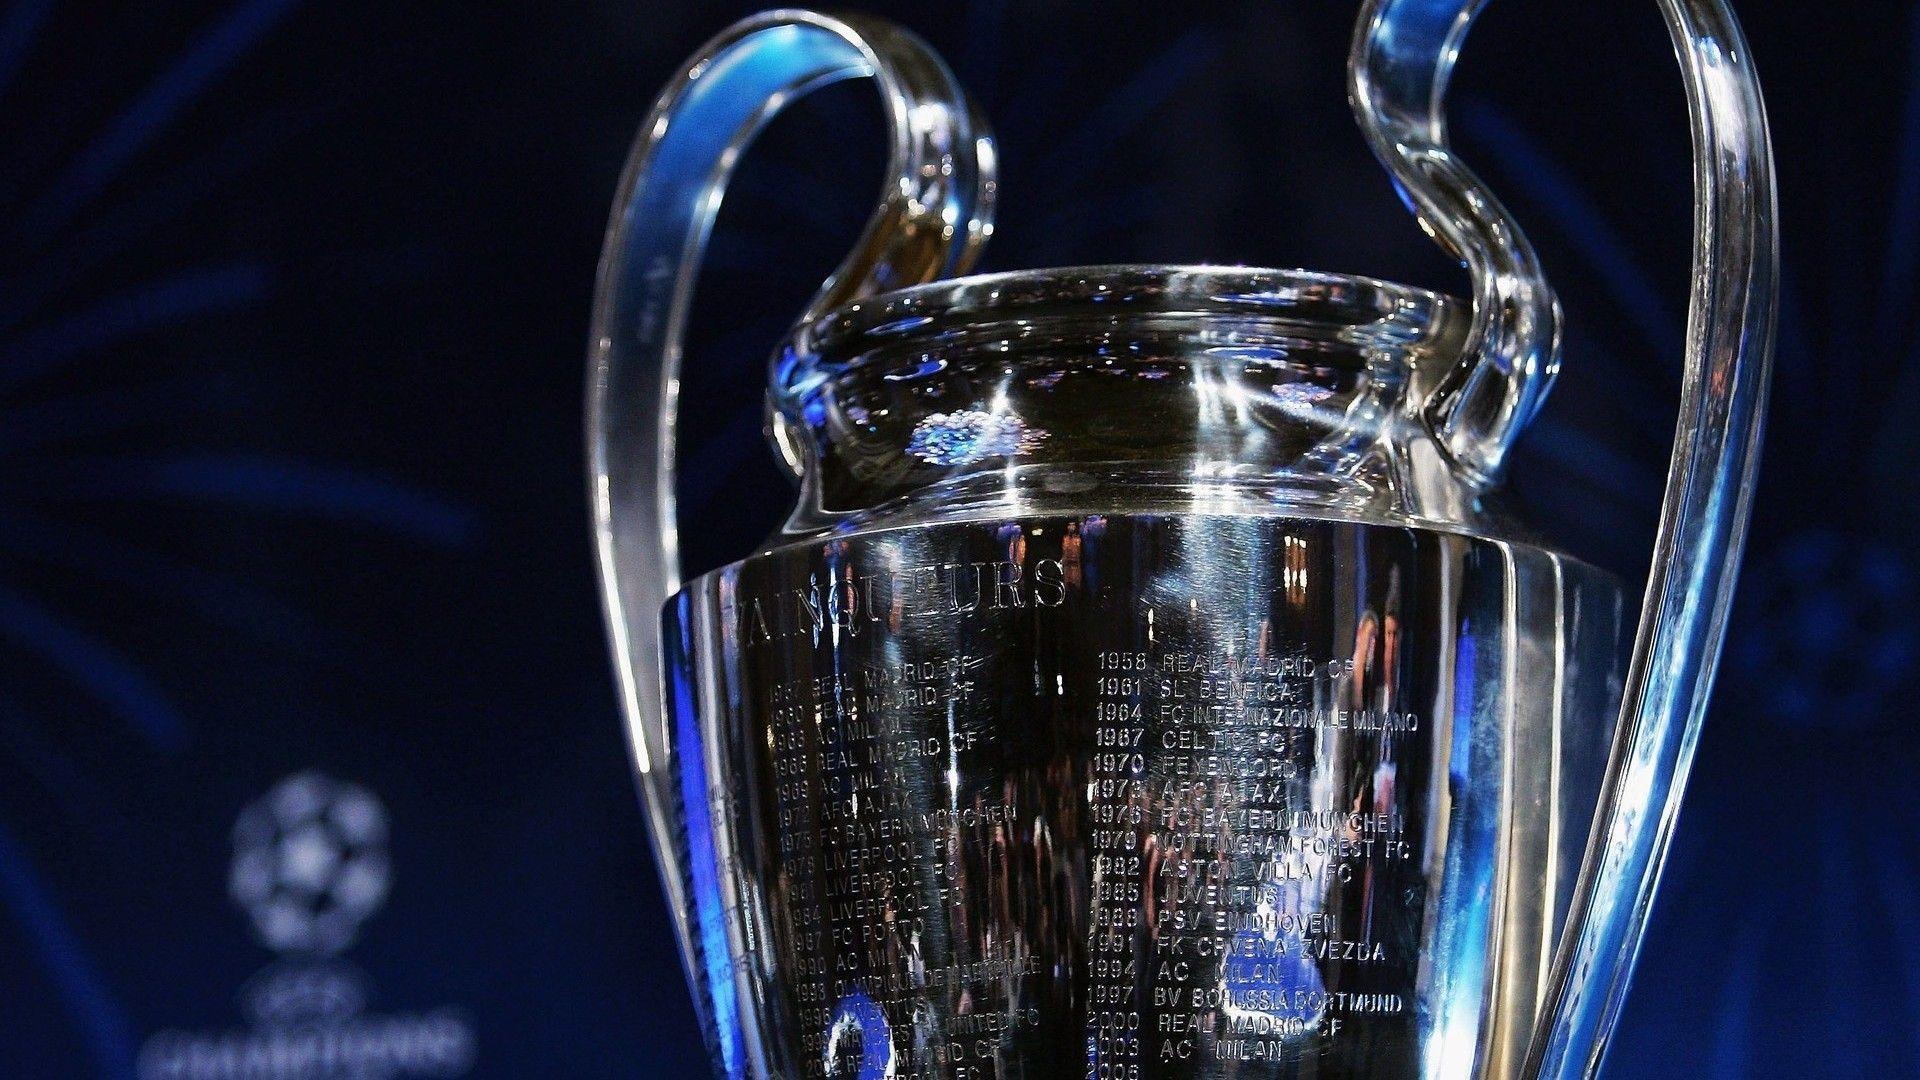 UEFA Champions League trophy Wallpaper | warnerboutique